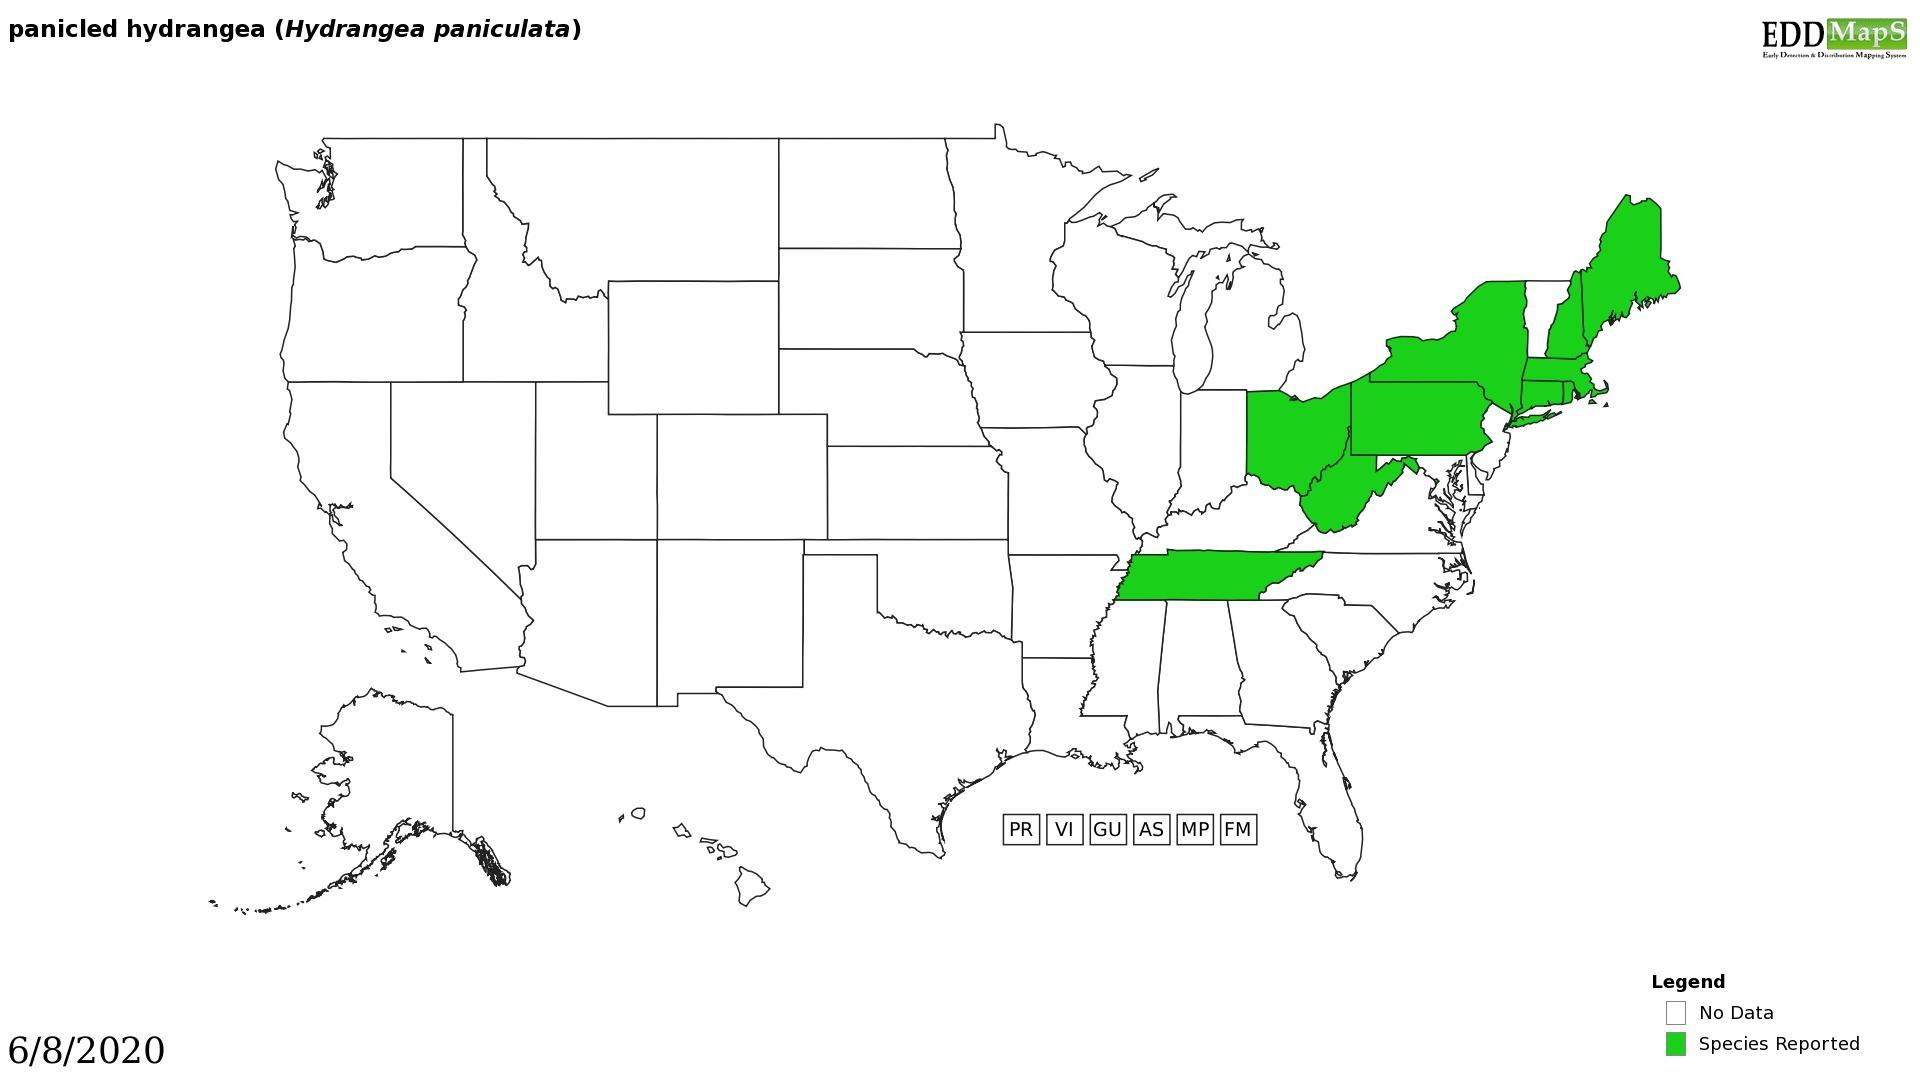 Hydrangea distribution - United States